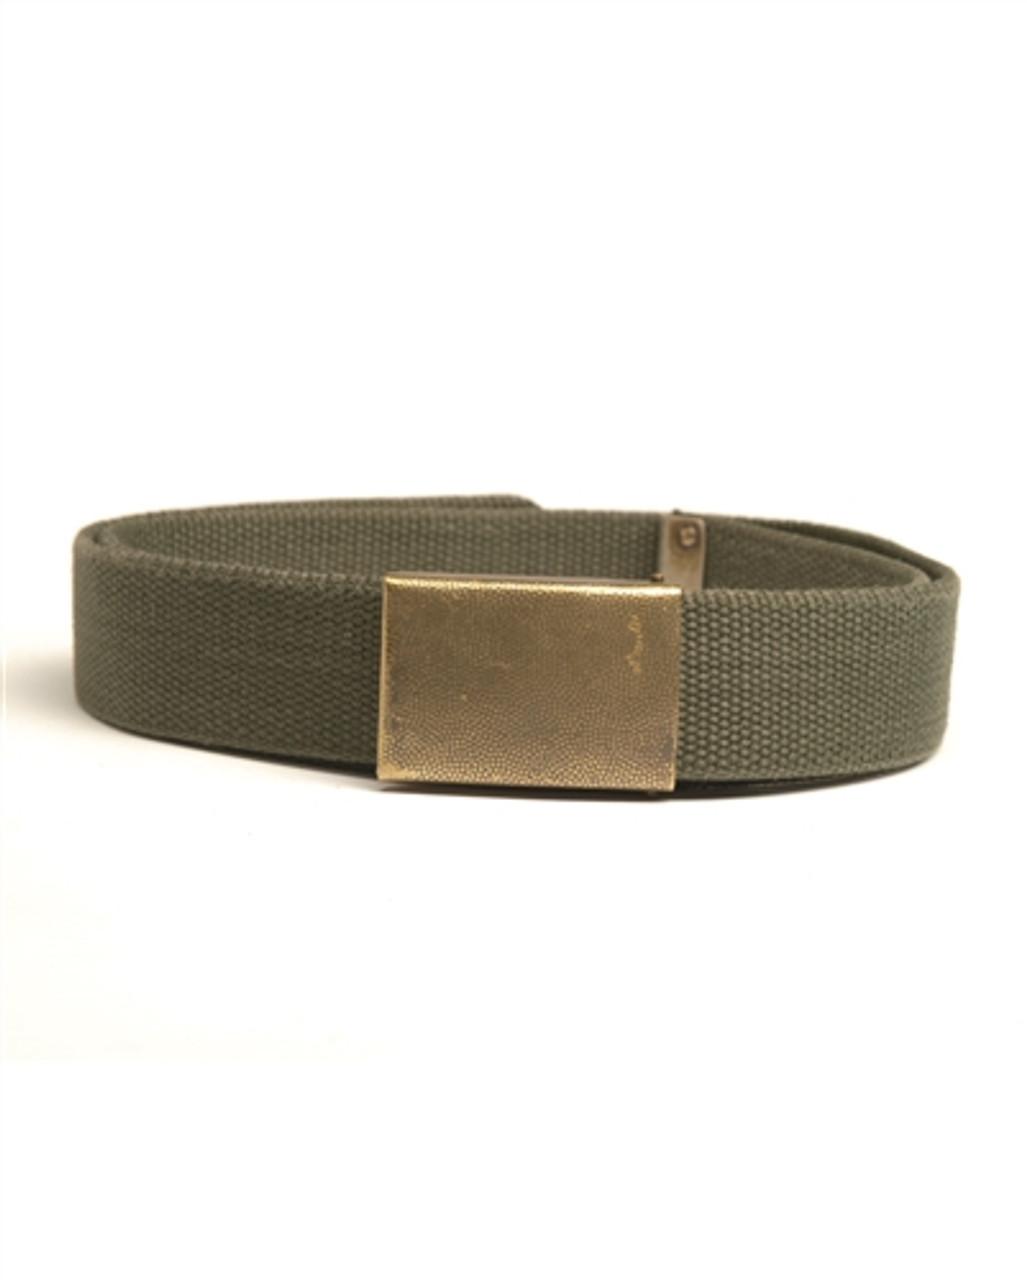 Bundeswehr Trouser Belt from Hessen Antique